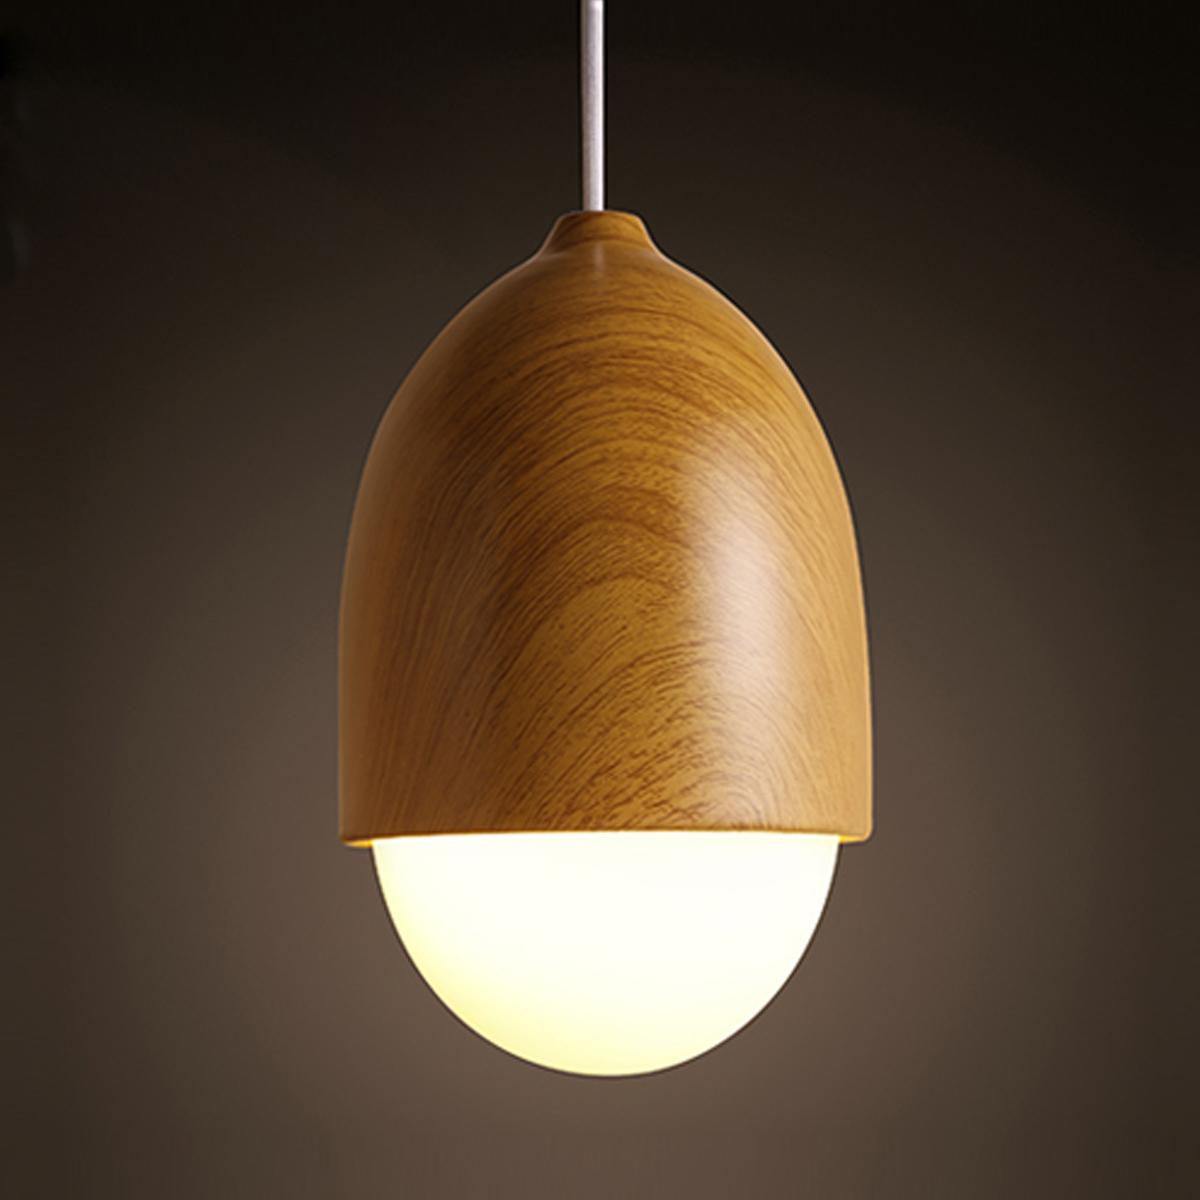 Mode japan einfache moderne pendelleuchten e27 led lampen schlafzimmer zähler lampen kreative mutter form pendelleuchte